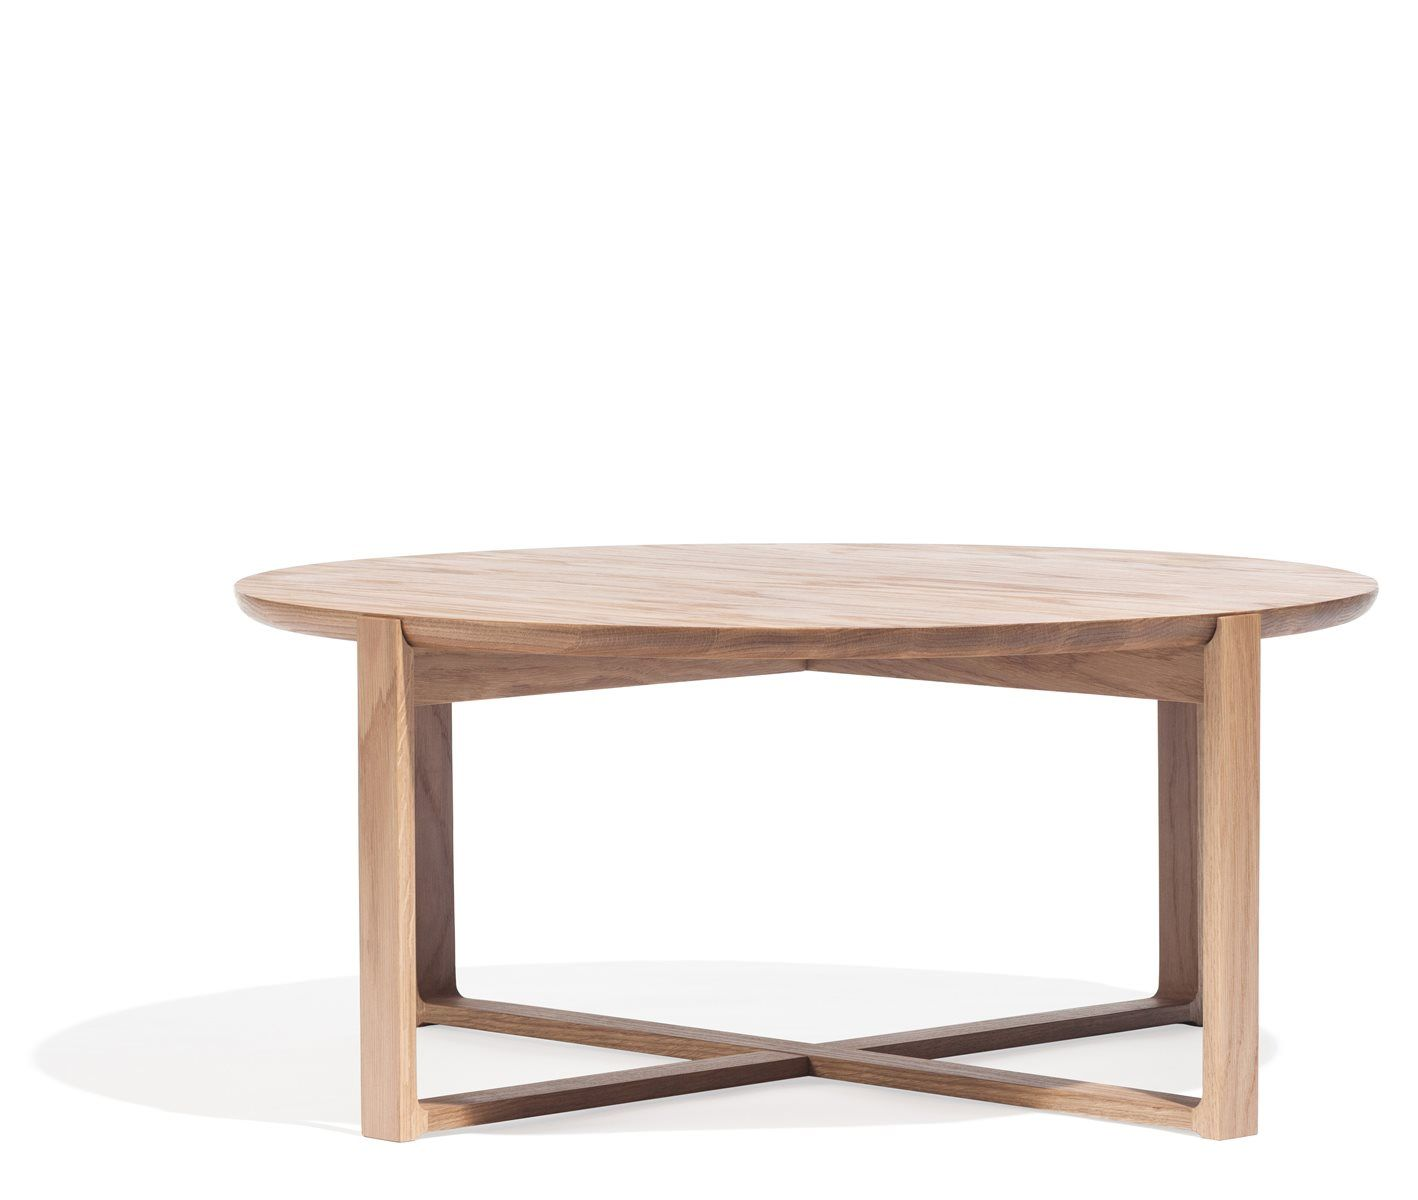 Stůl Delta - coffee 724 | TON a.s. - Židle vyrobené lidmi